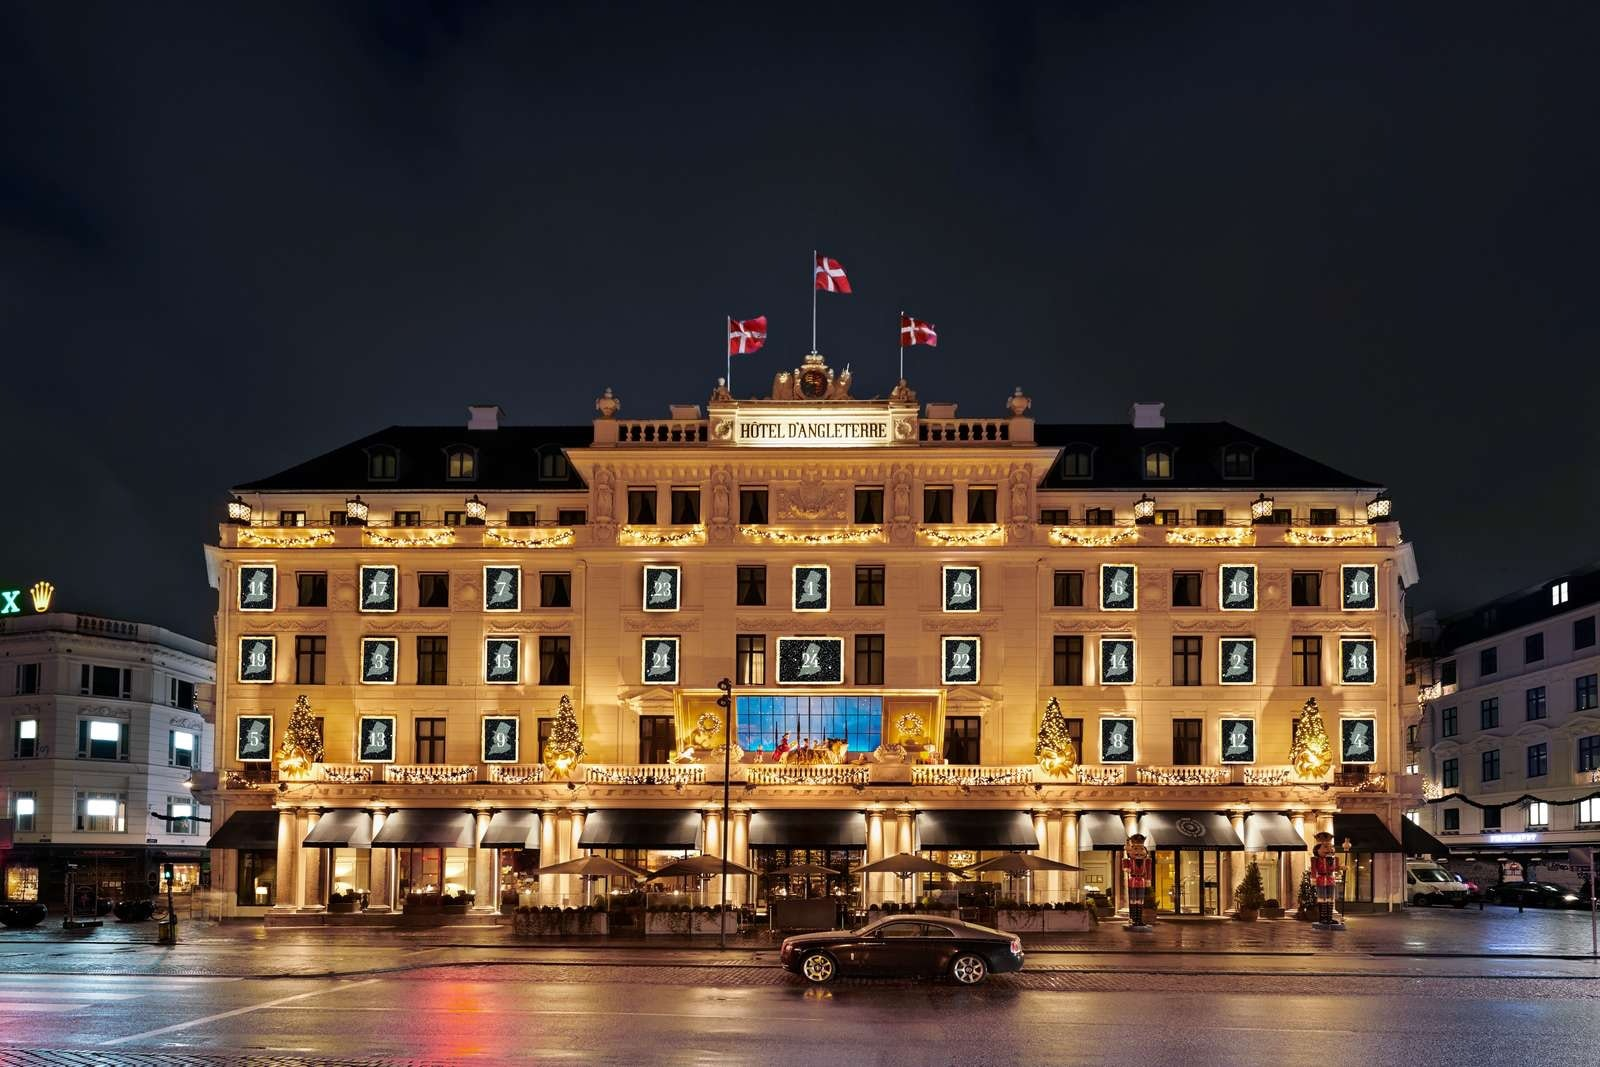 Hotel D'Angleterre julelys